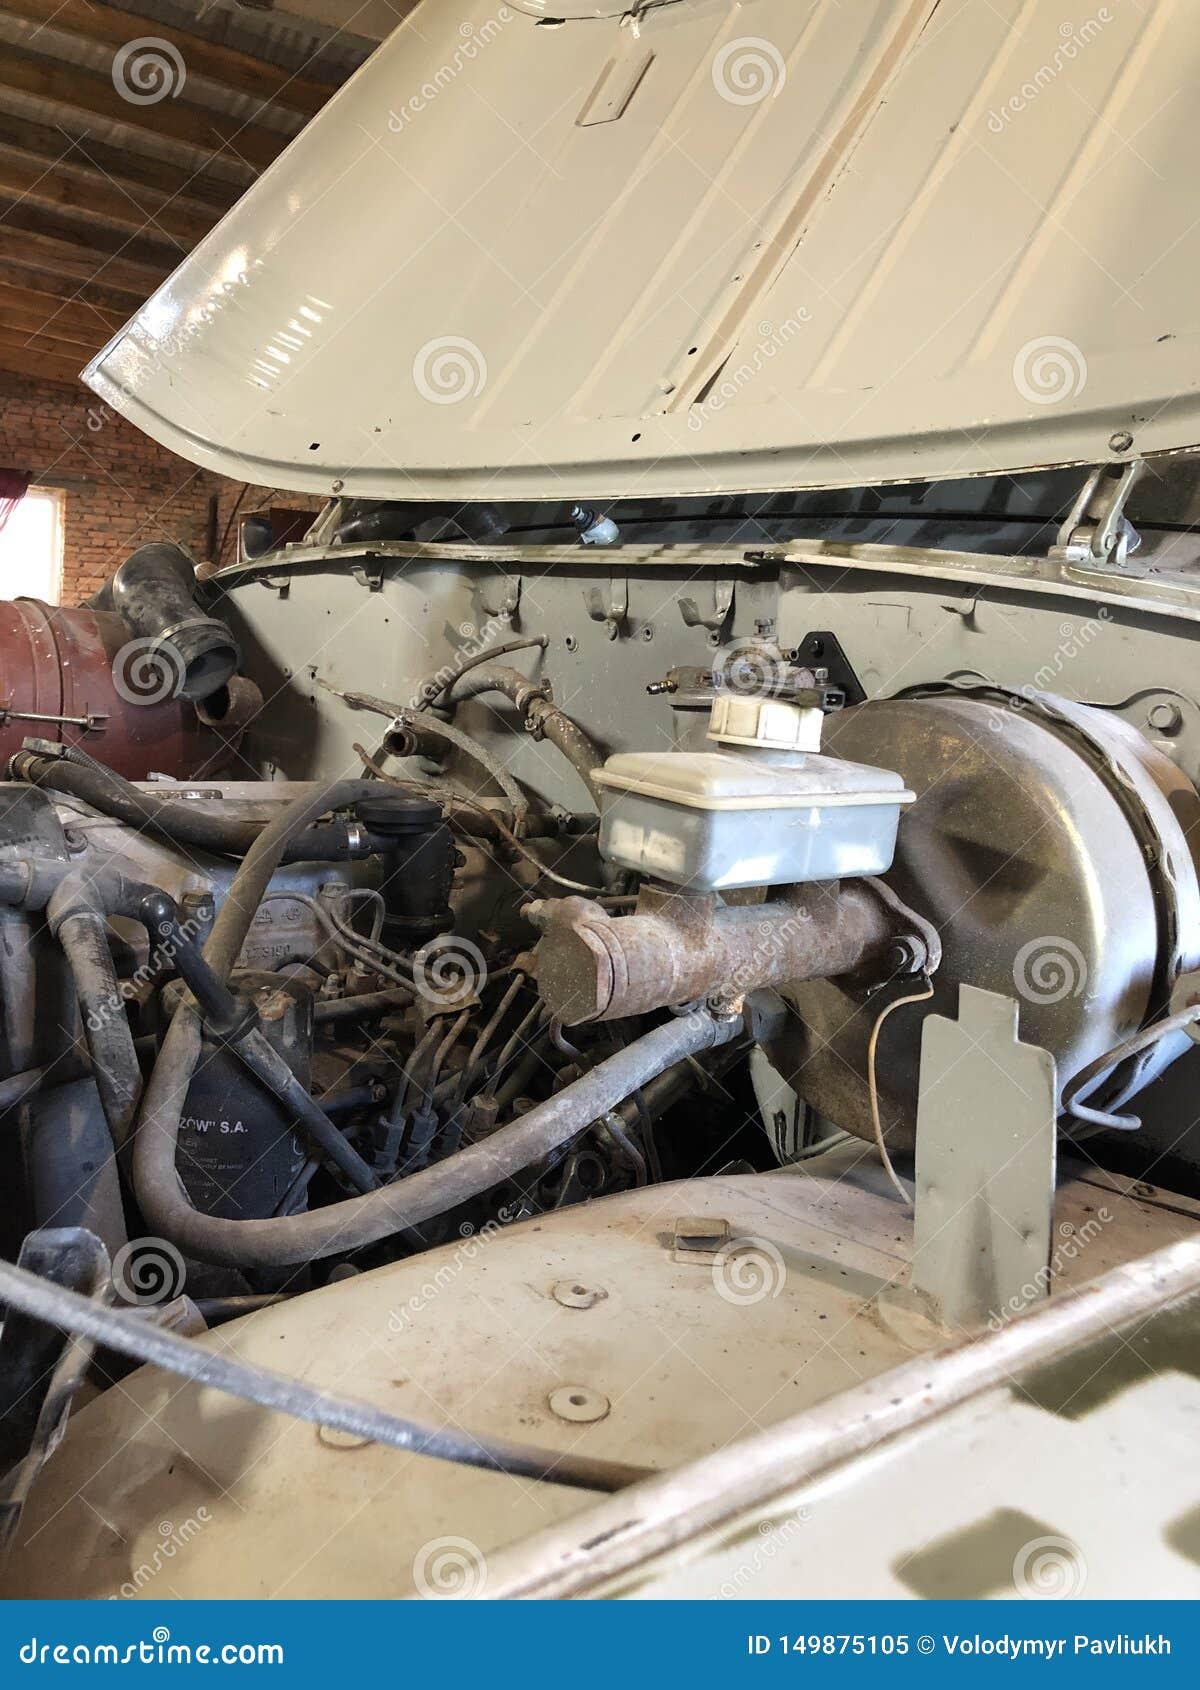 Repair of the old UAZ motor in 2003, in the thrown garage